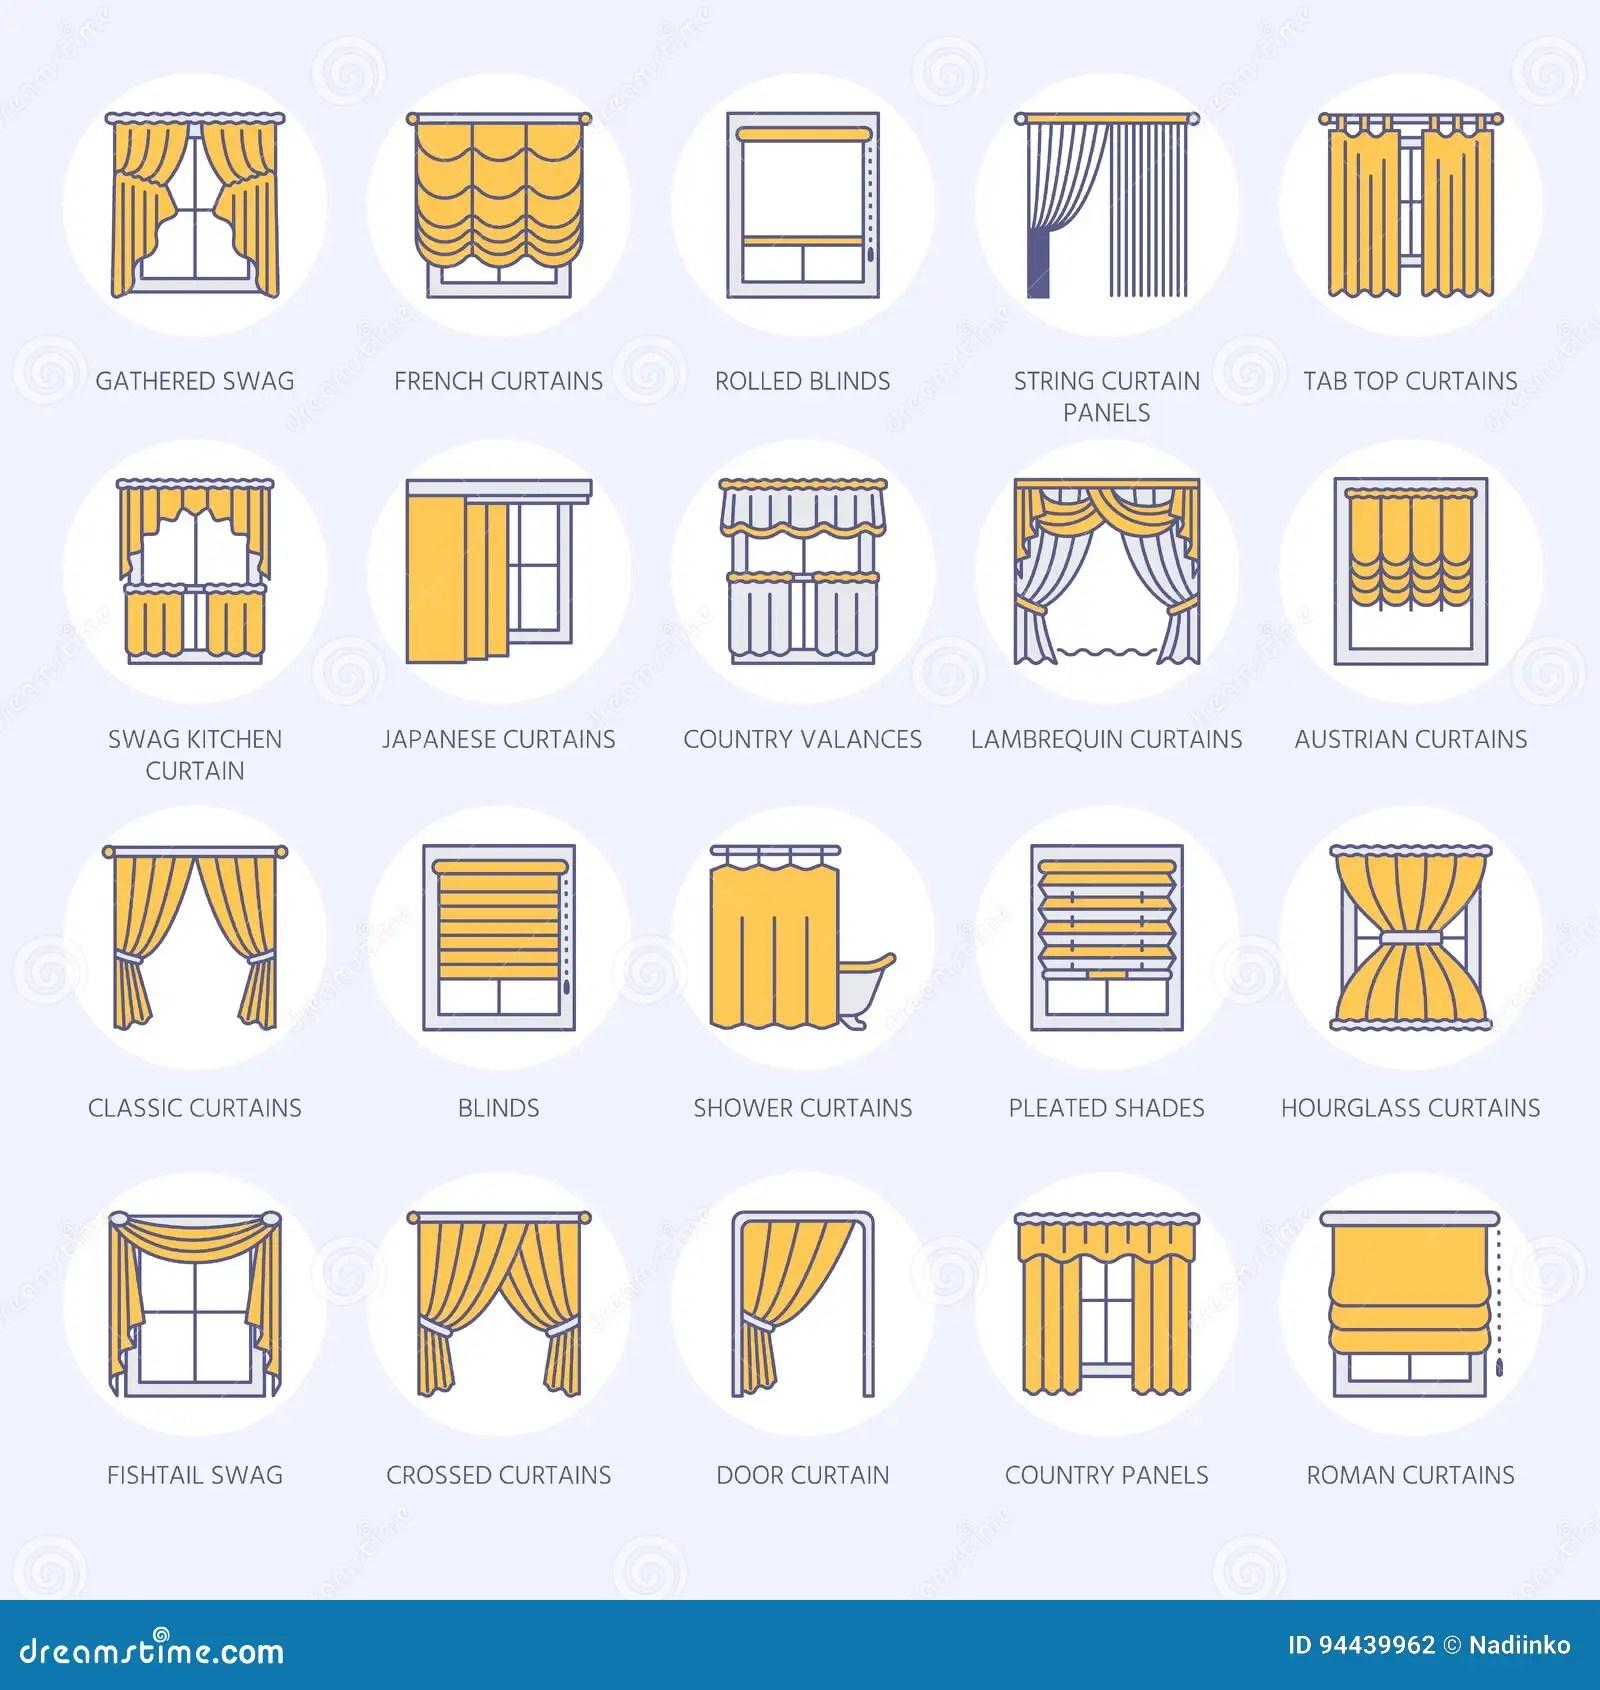 swag kitchen curtains island with folding leaf 窗帘 树荫线象各种各样的室使变暗的装饰 lambrequin 赃物 法国帷幕 窗帘和滚动的盘区房子装饰的室内设计稀薄的线性标志购物蓝色颜色